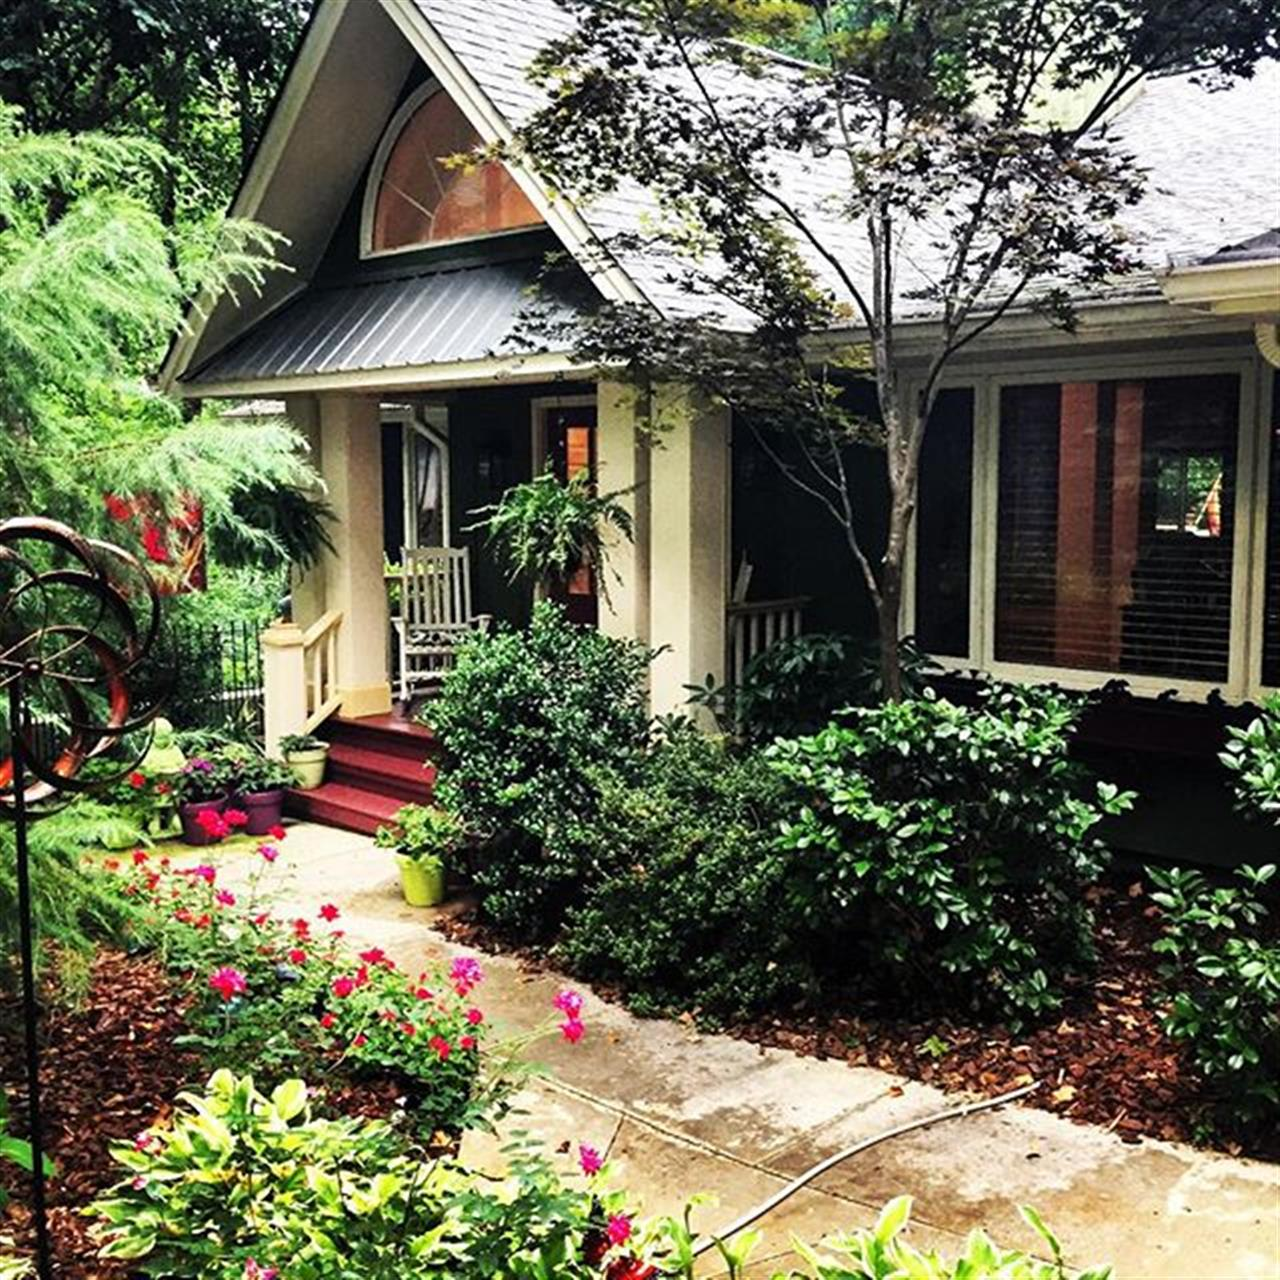 Lake Lanier home in Gainesville GA